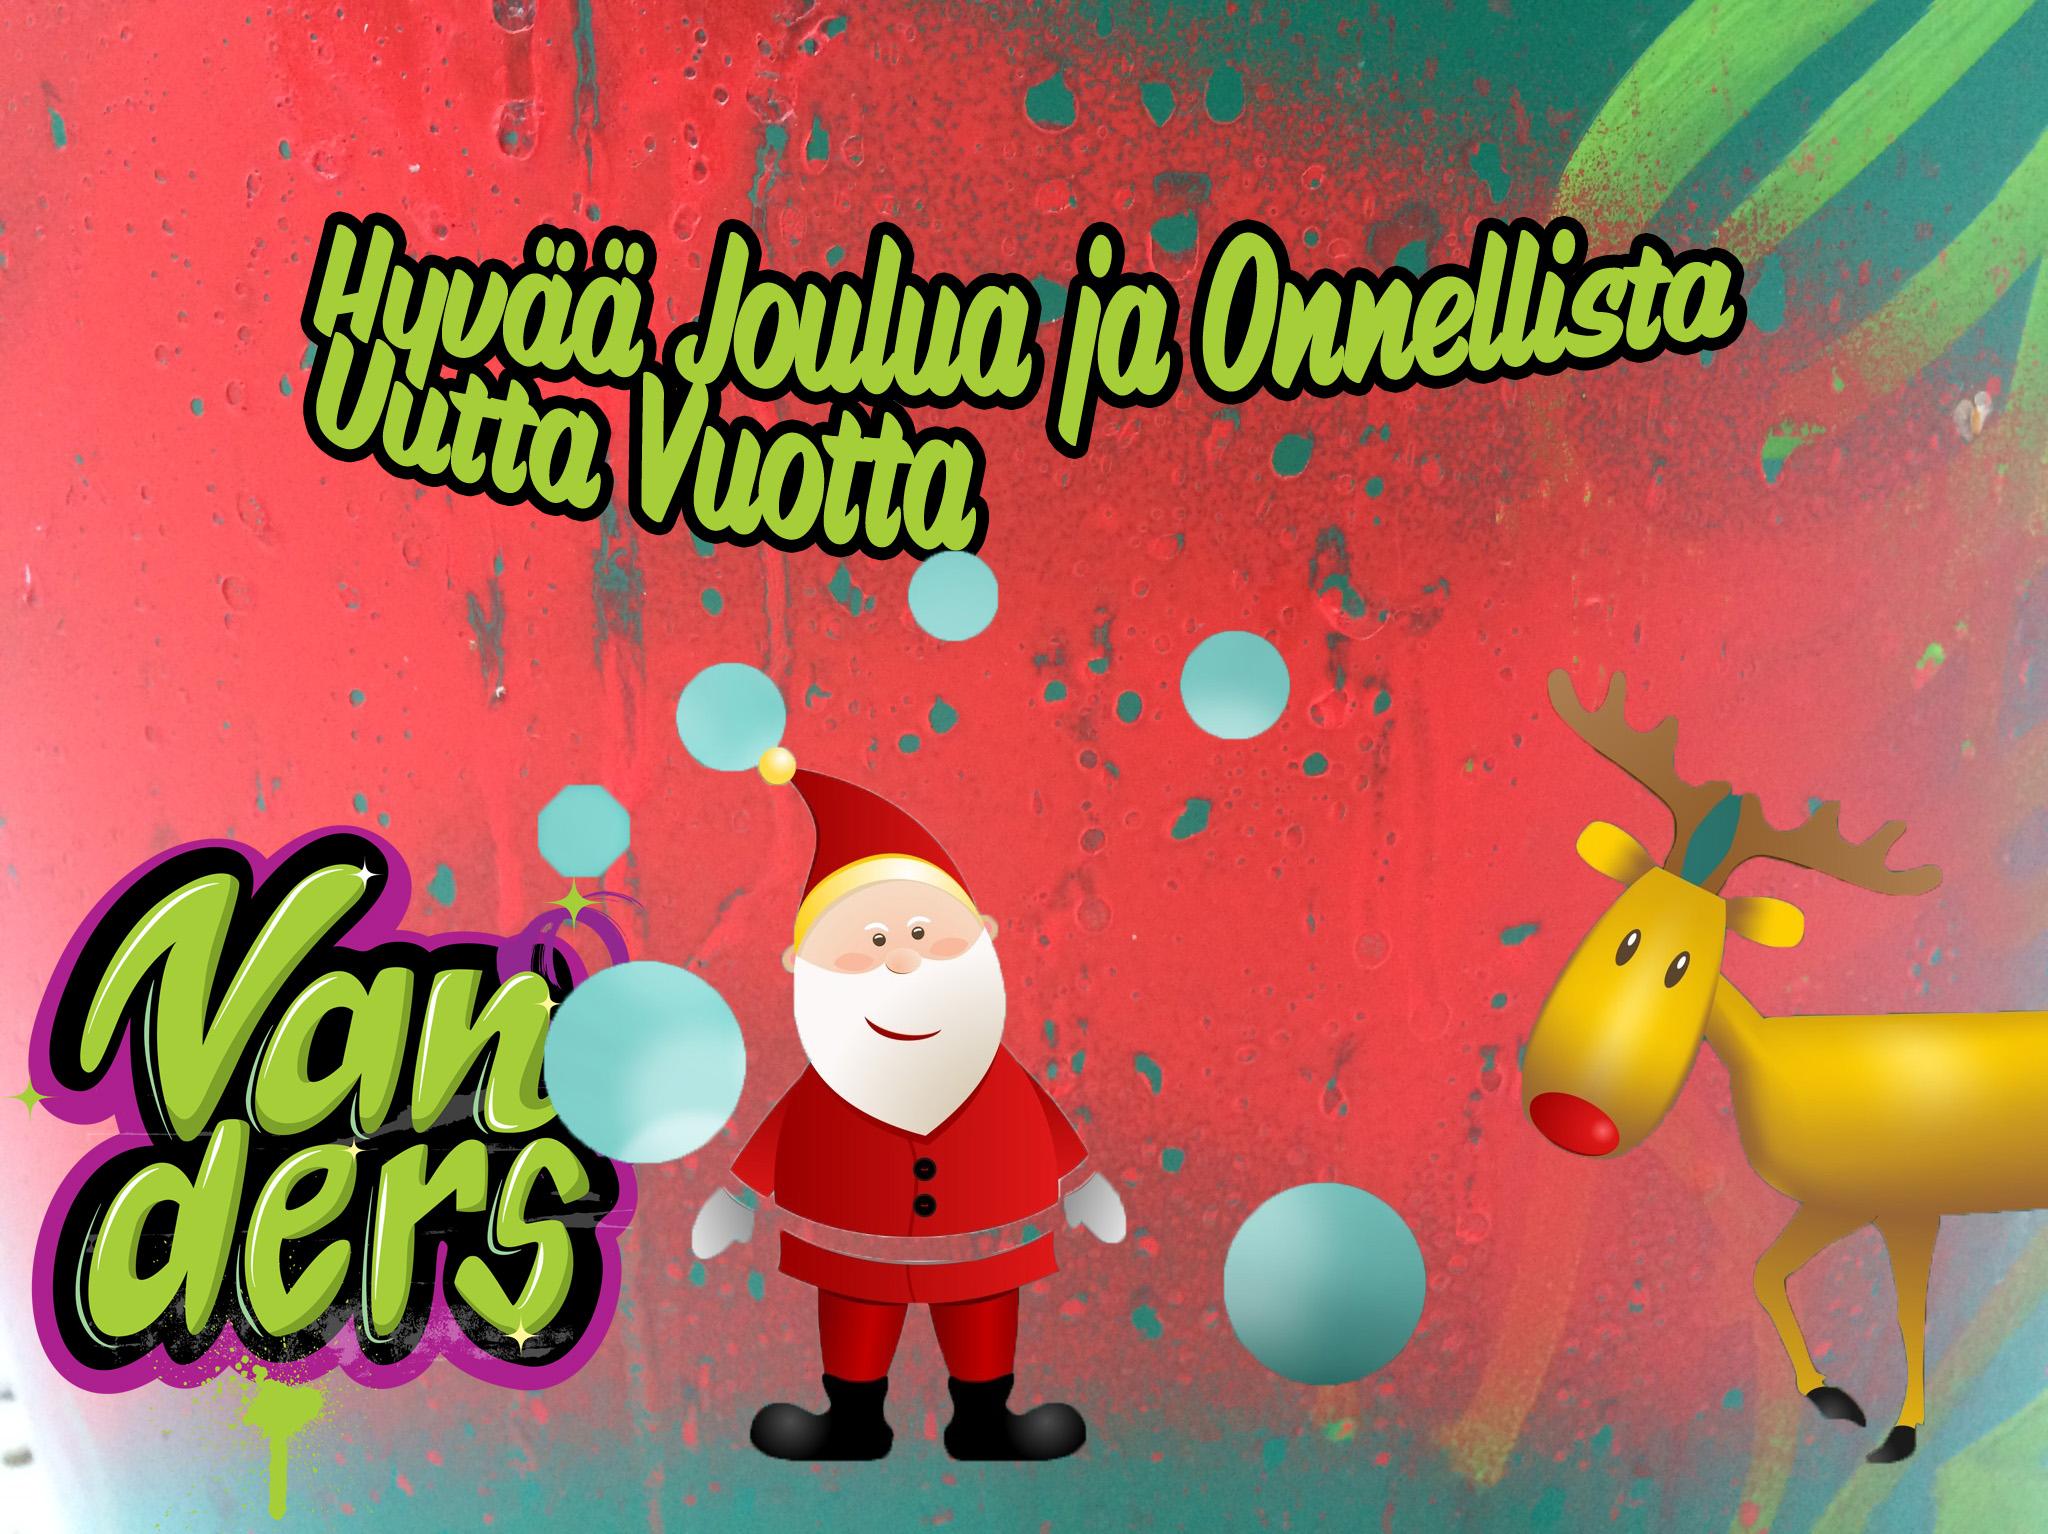 Vanders lomailee jouluna 22.12.2015 – 4.1.2015